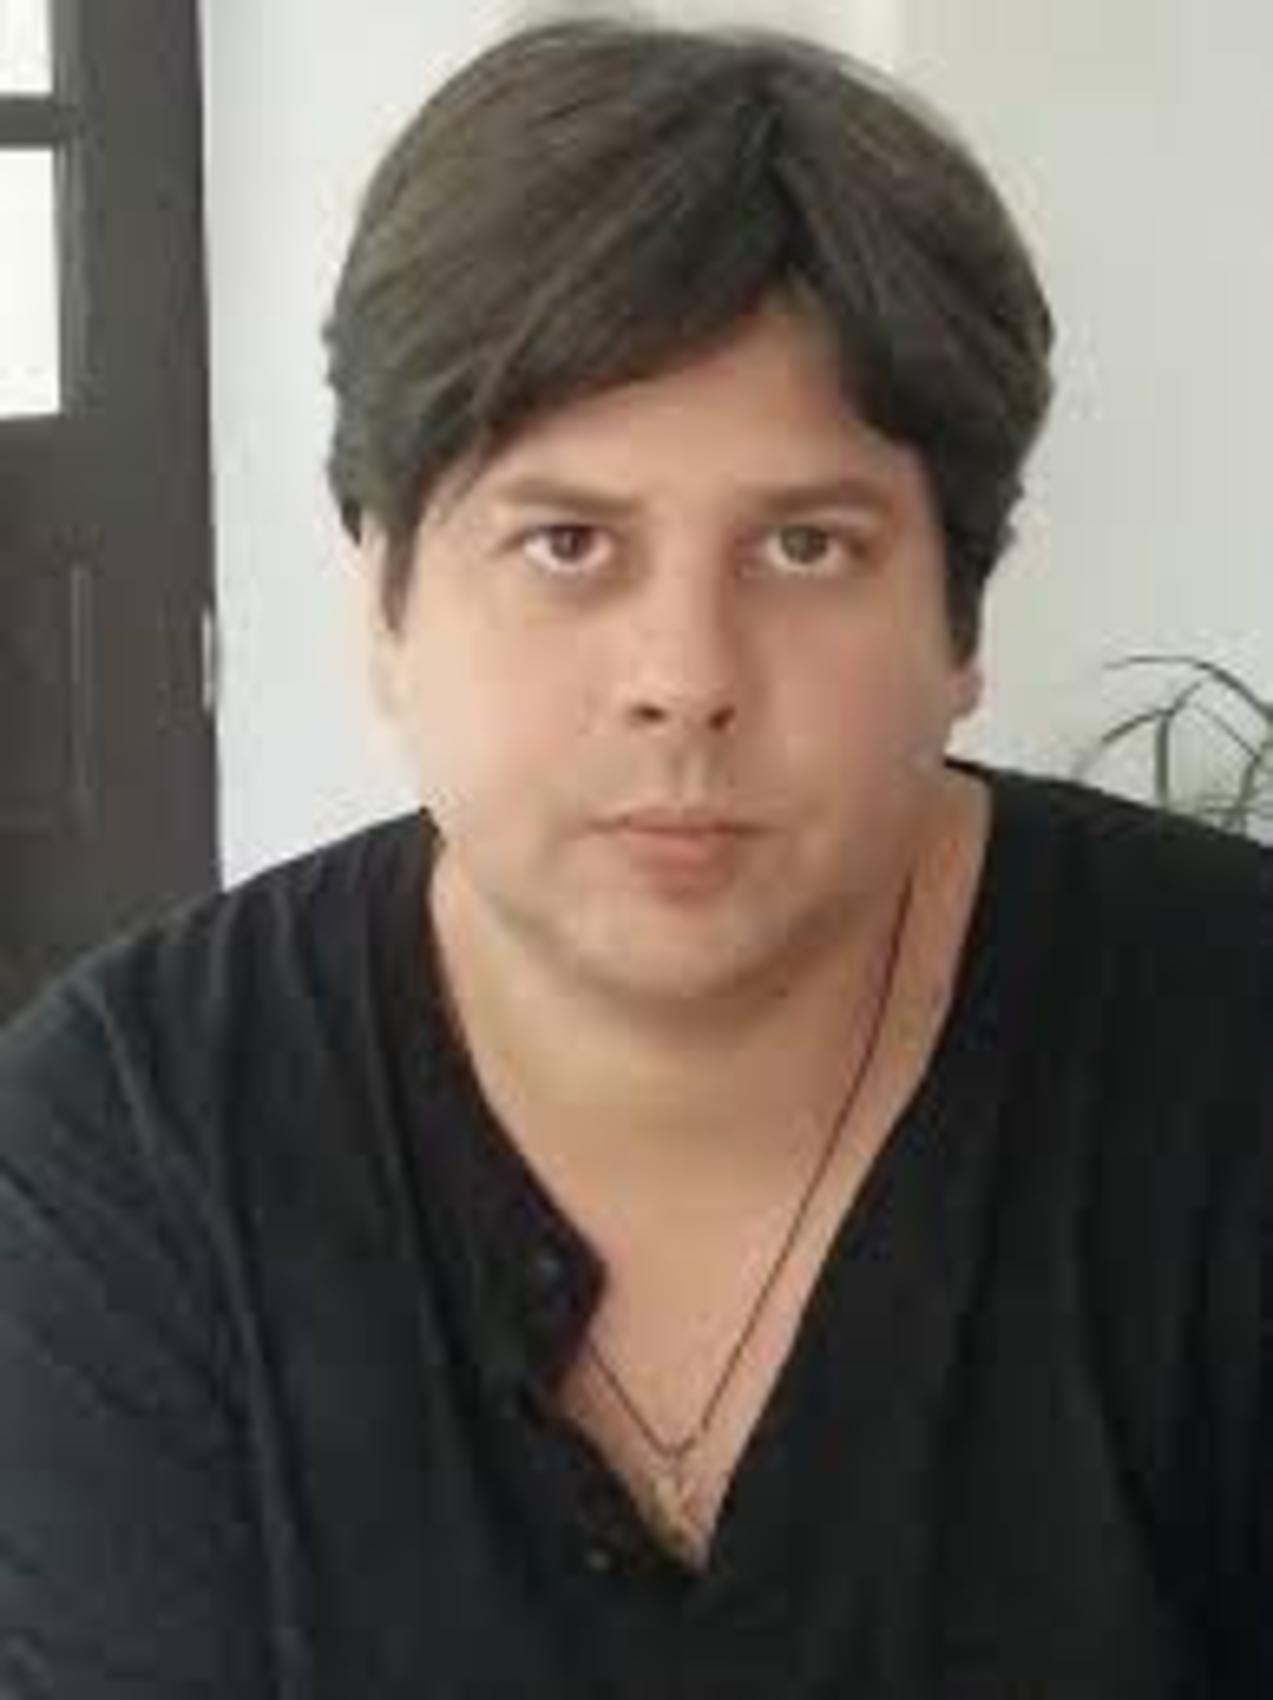 Krisztian Kathona